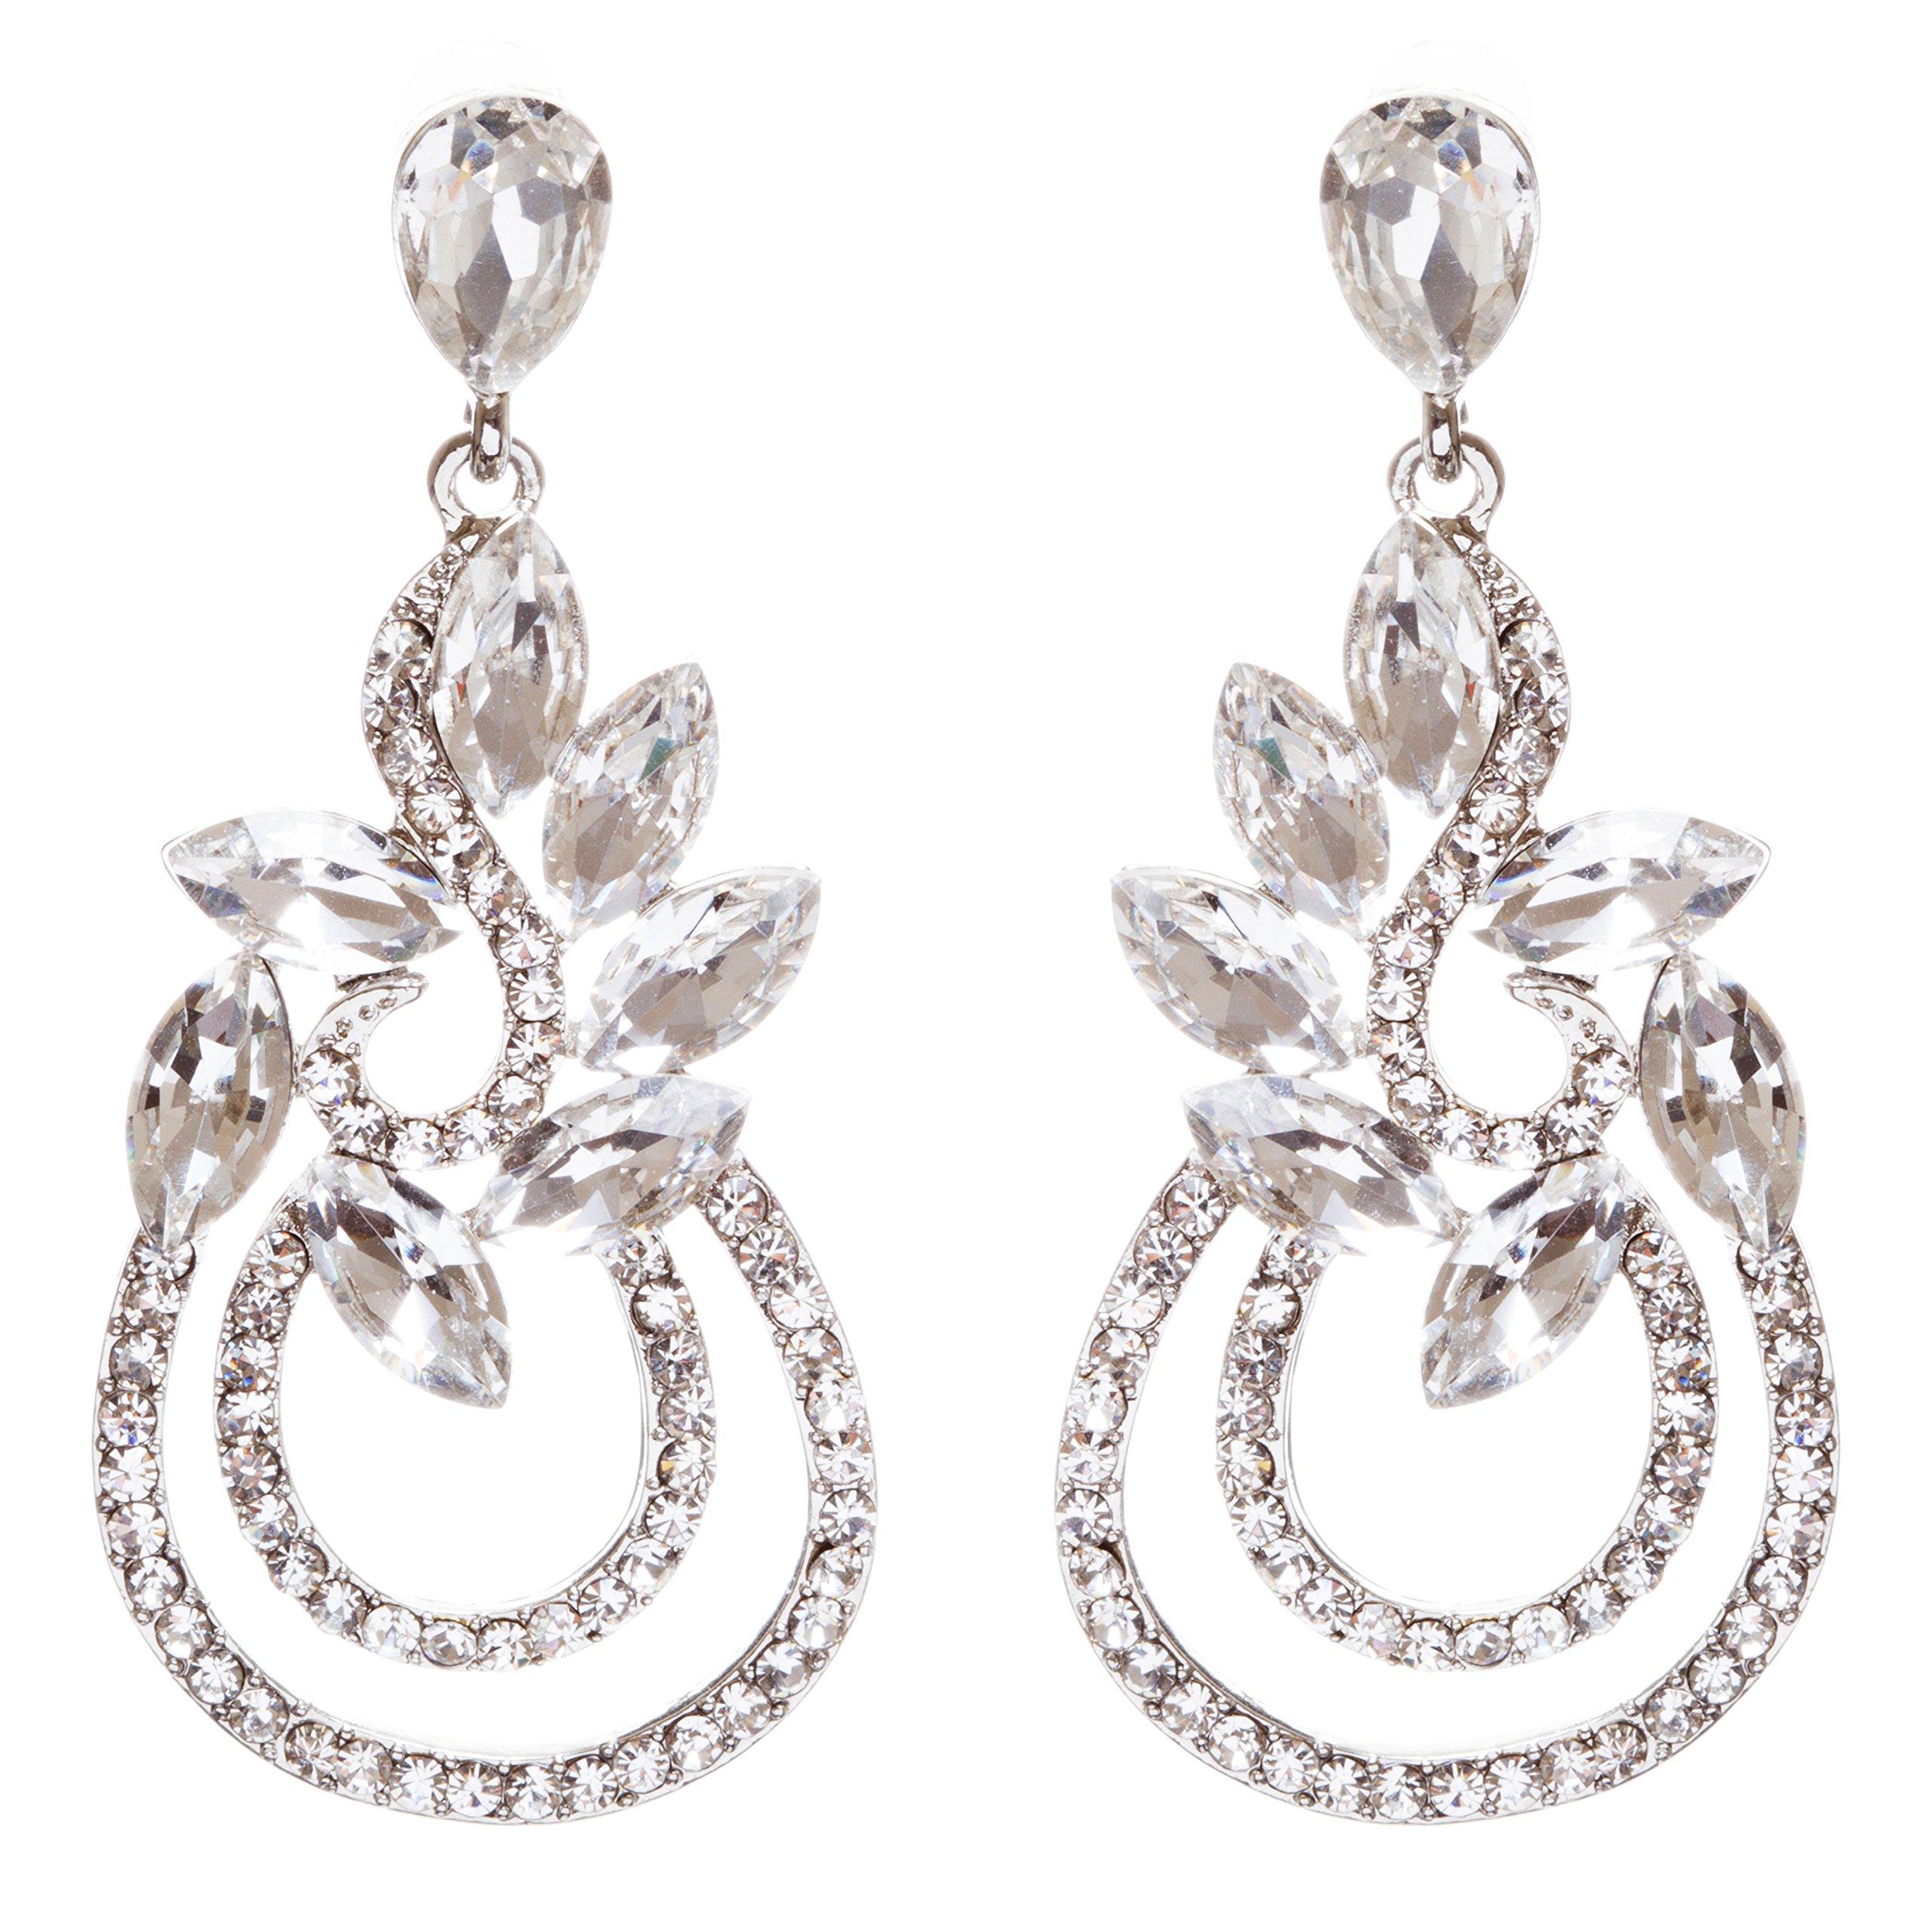 ACCESSORIESFOREVER Women Bridal Wedding Jewelry Crystal Rhinestone Elegant Dangle Earrings E951 Silver